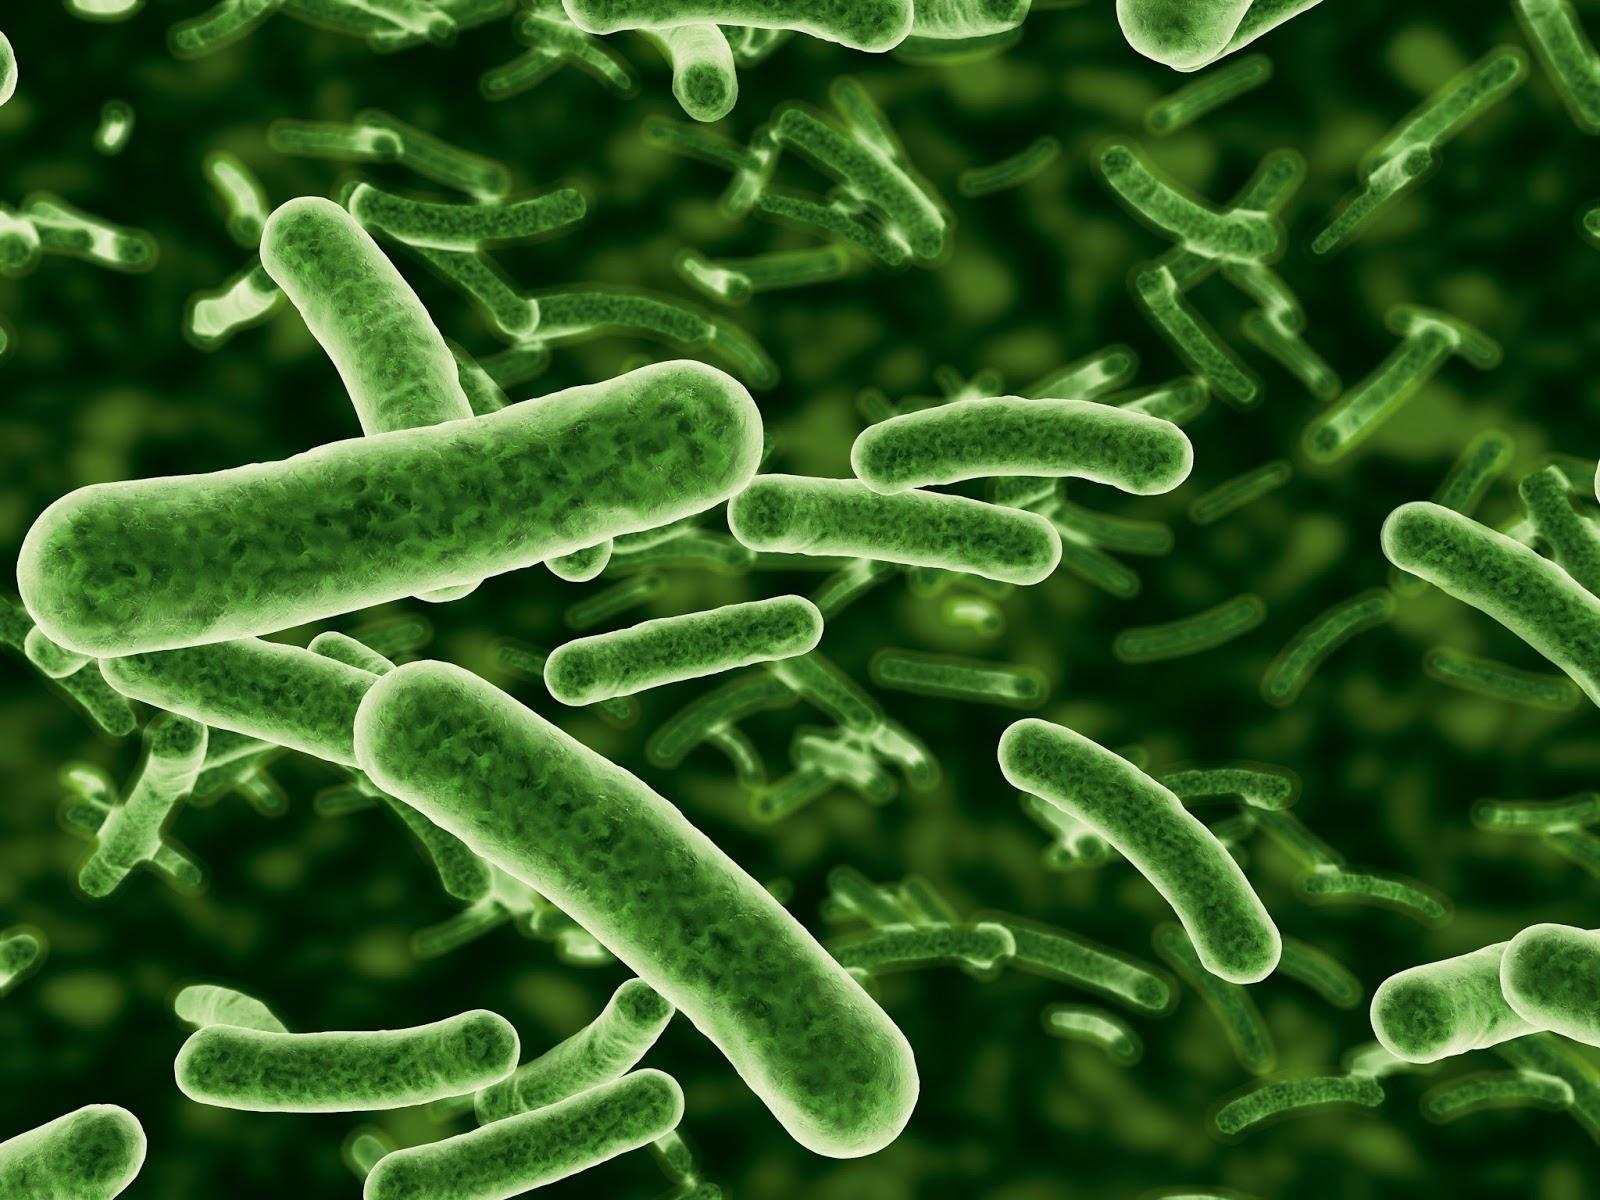 bacterii autotrofe vaccin papillomavirus apres 19 ans